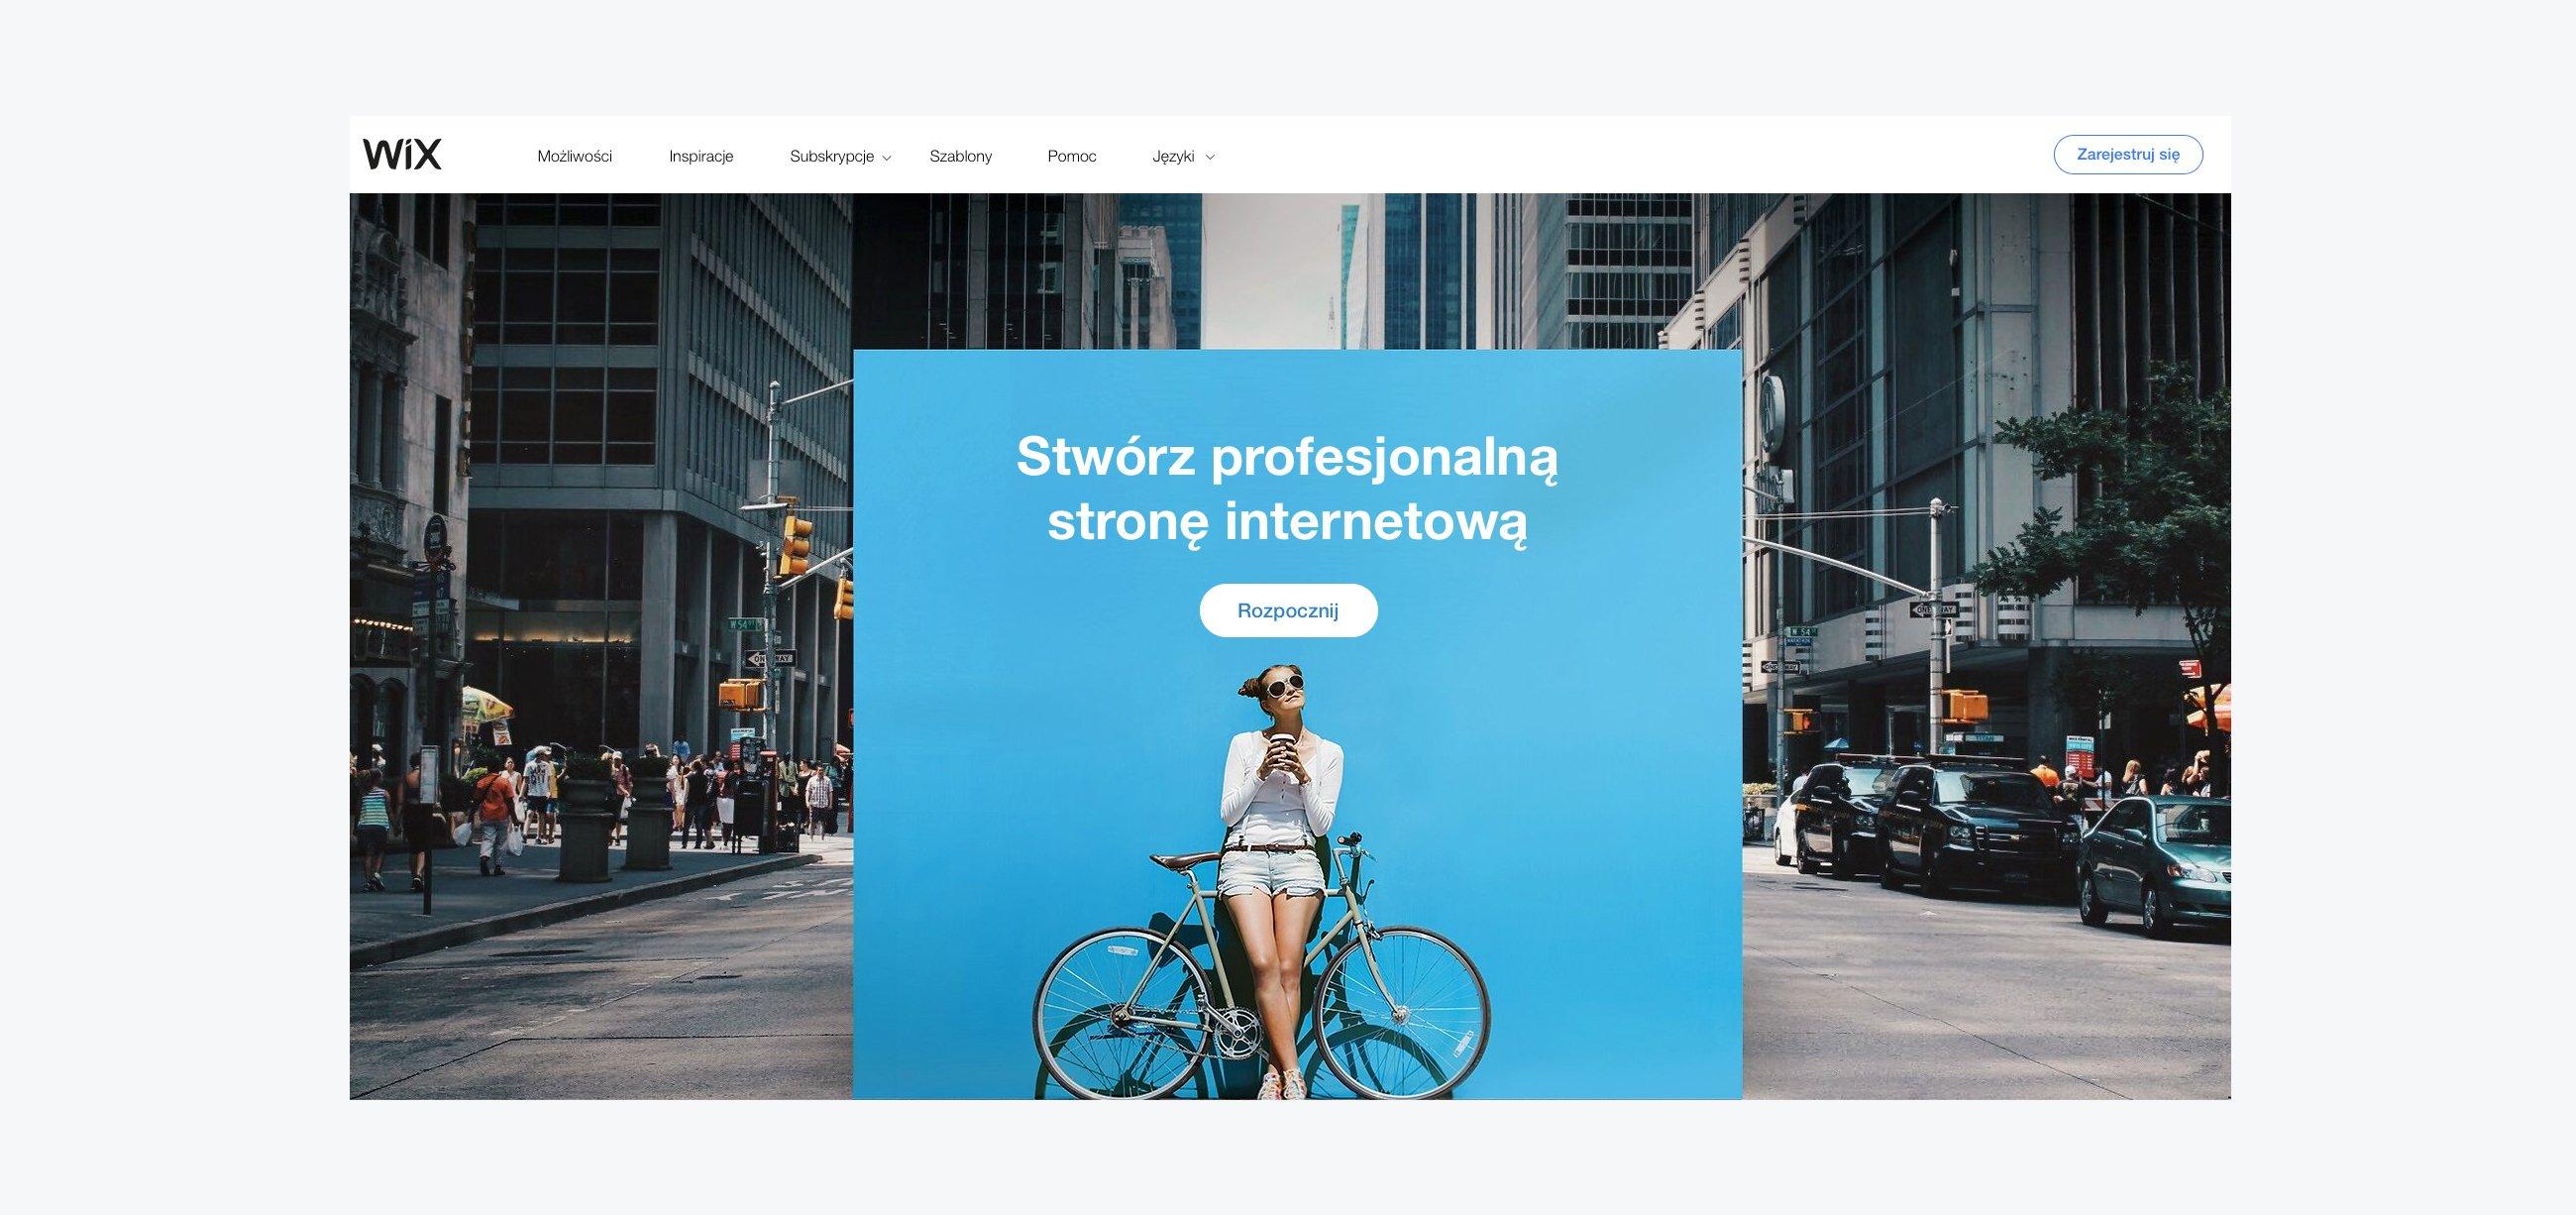 Top 10 eCommerce Platforms - Wix